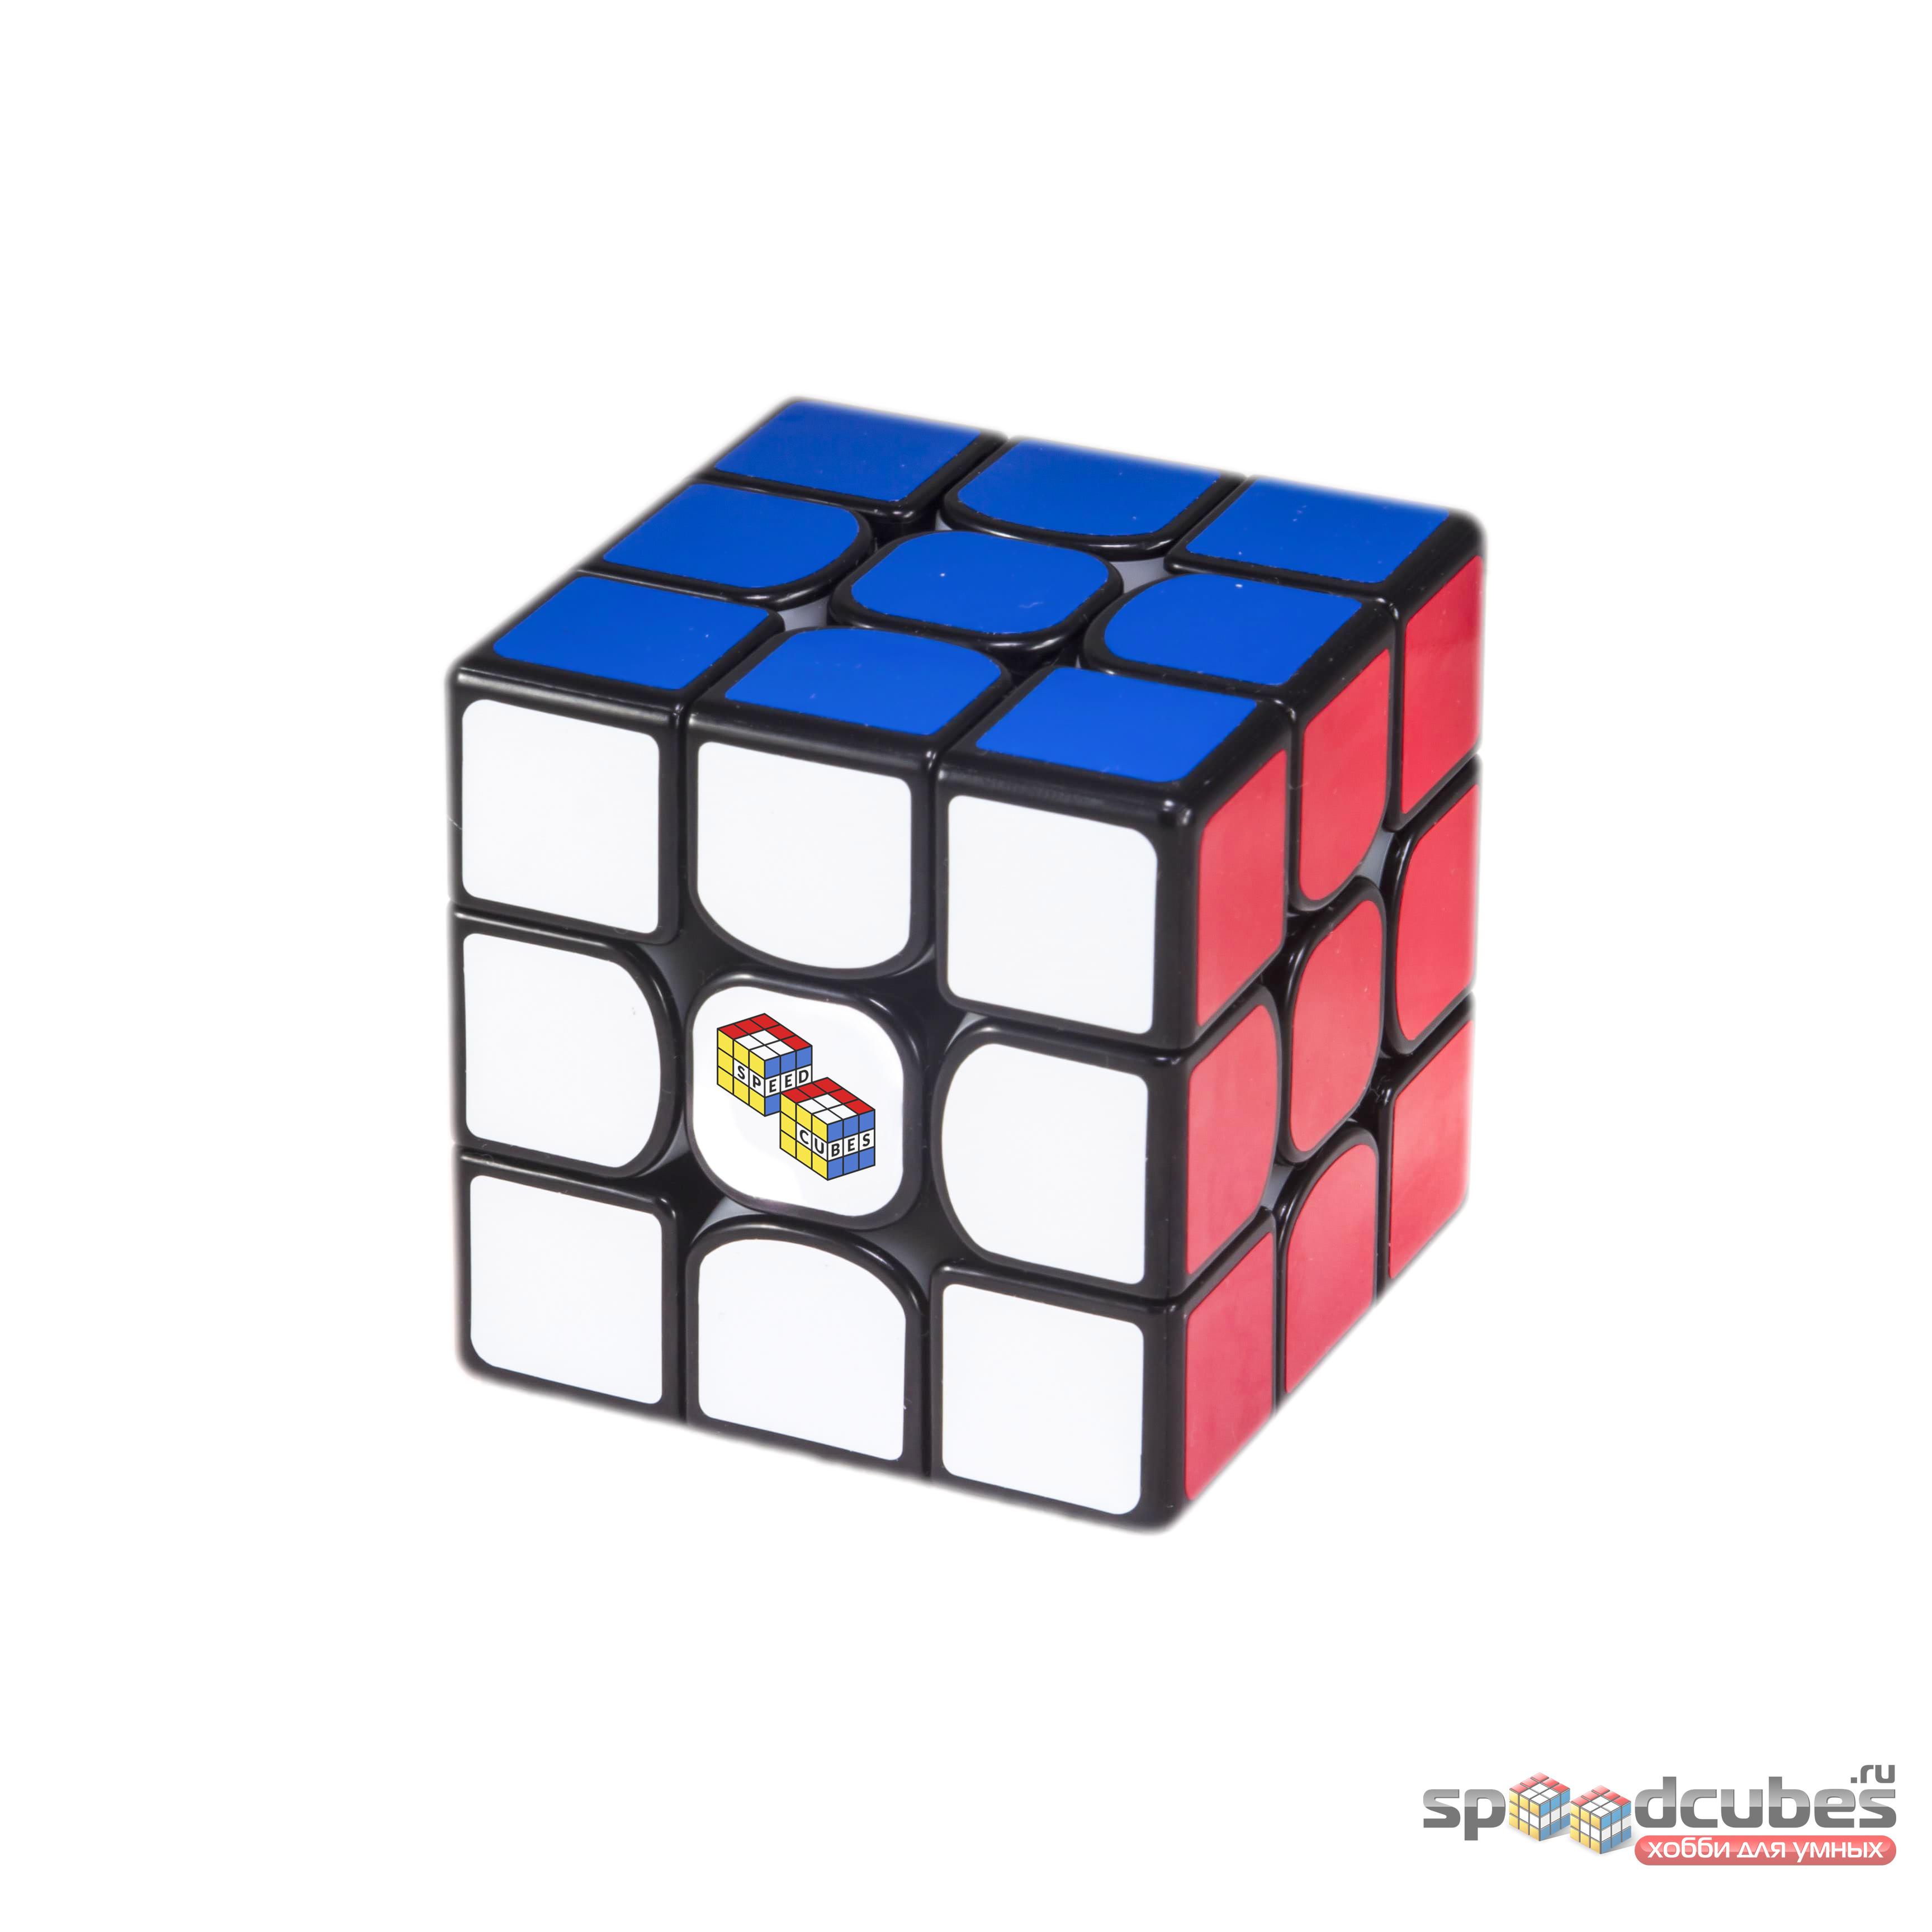 Стикер на кубик «Speedcubes.ru»